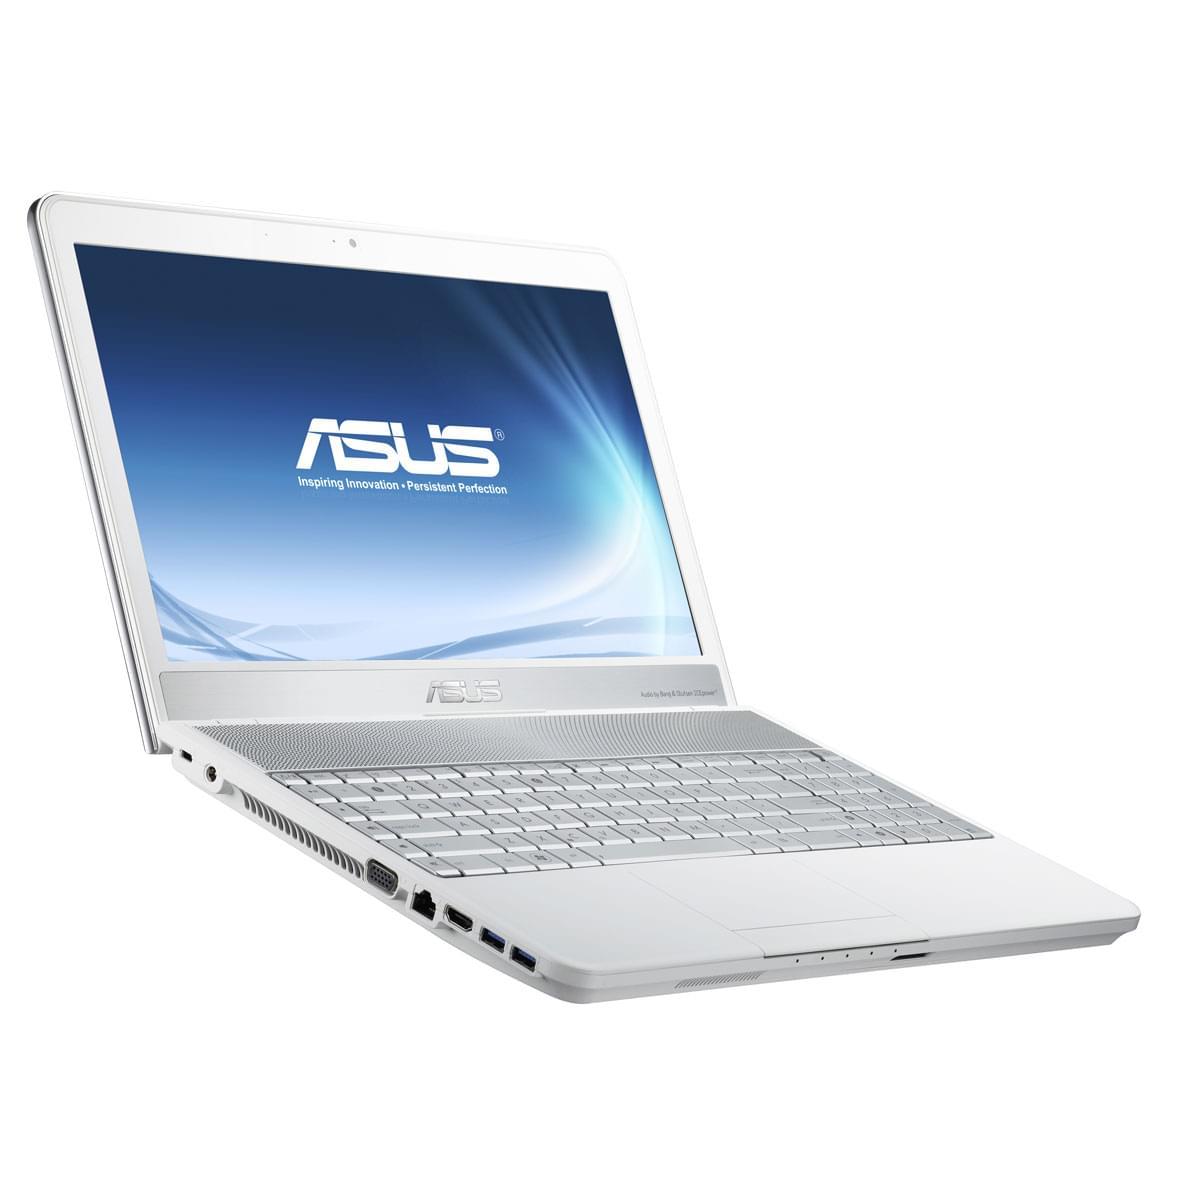 Asus N55SL-S2118V - PC portable Asus - Cybertek.fr - 0